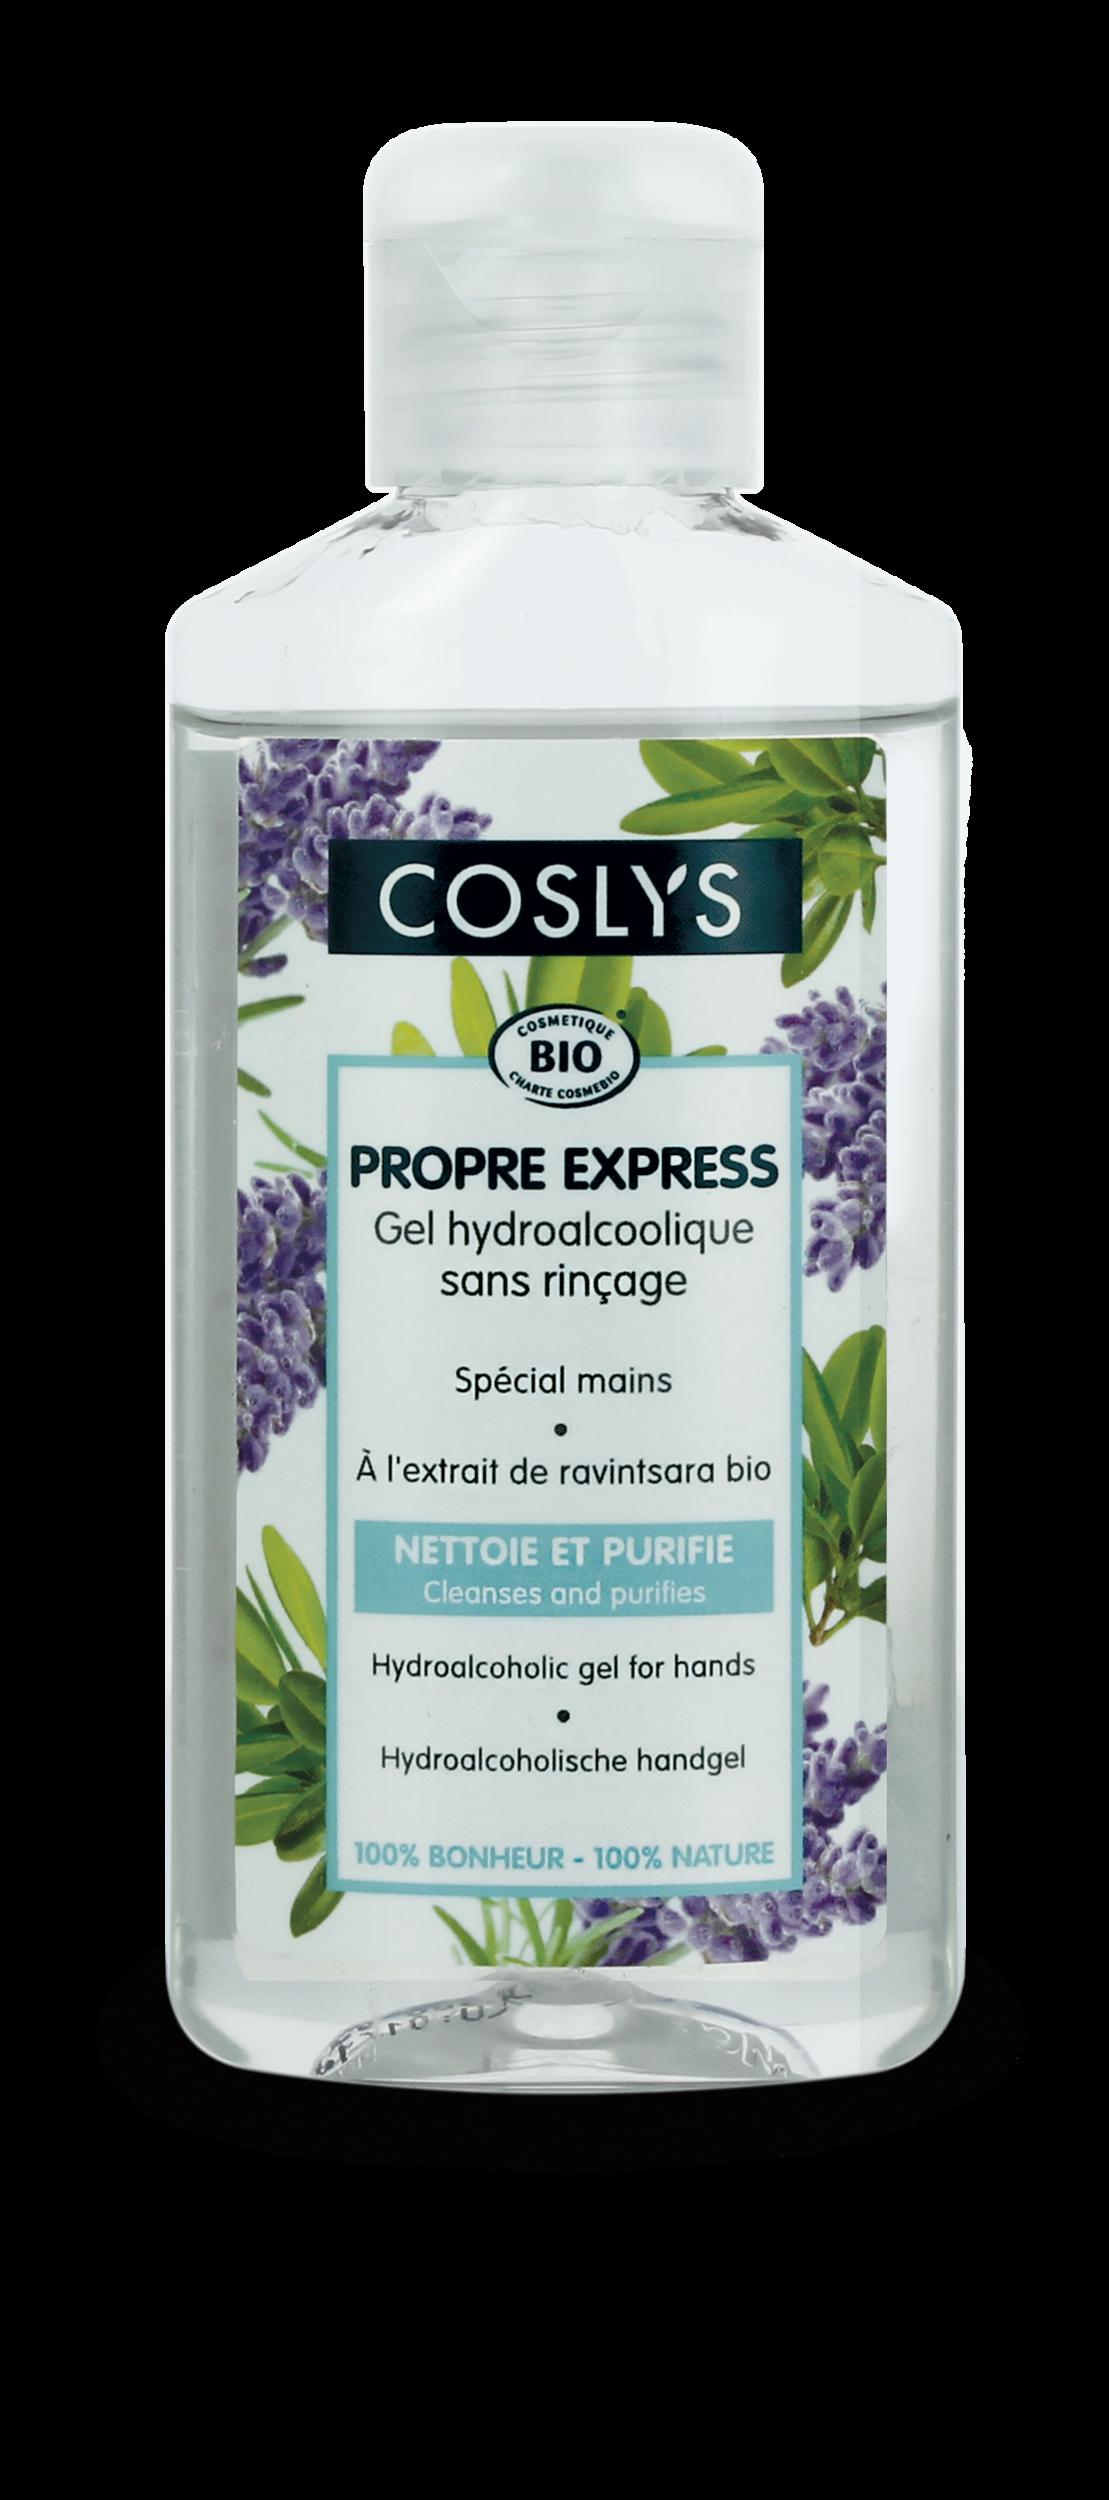 Coslys-gel hydroalcoolique-100ml